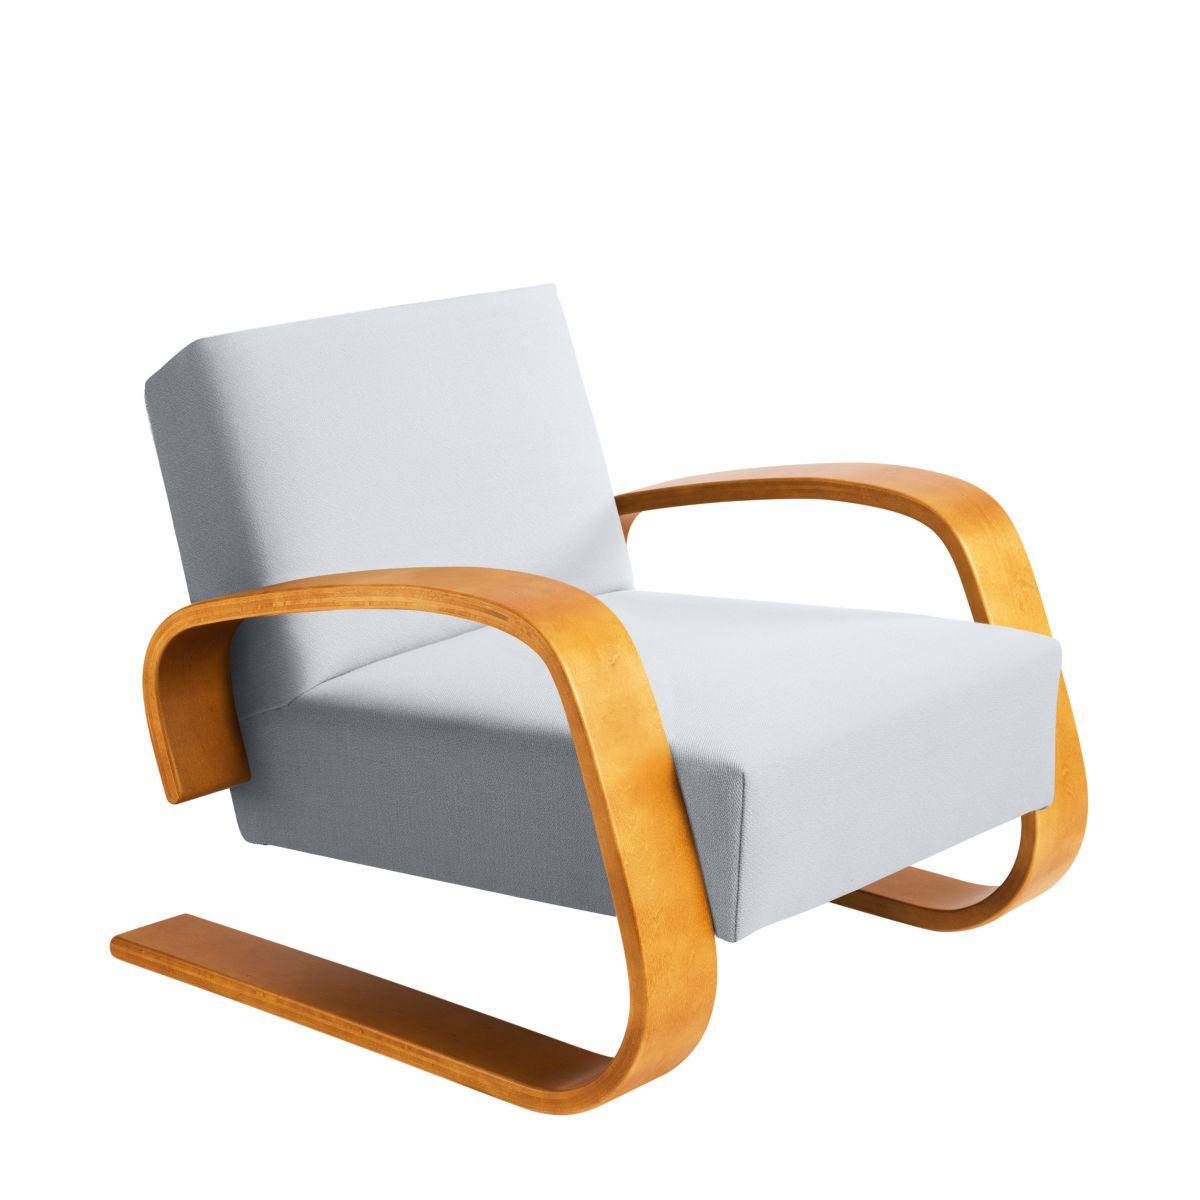 Armchair 400 _Tank  honey stain birch_seat fabric upholstery Artek grey